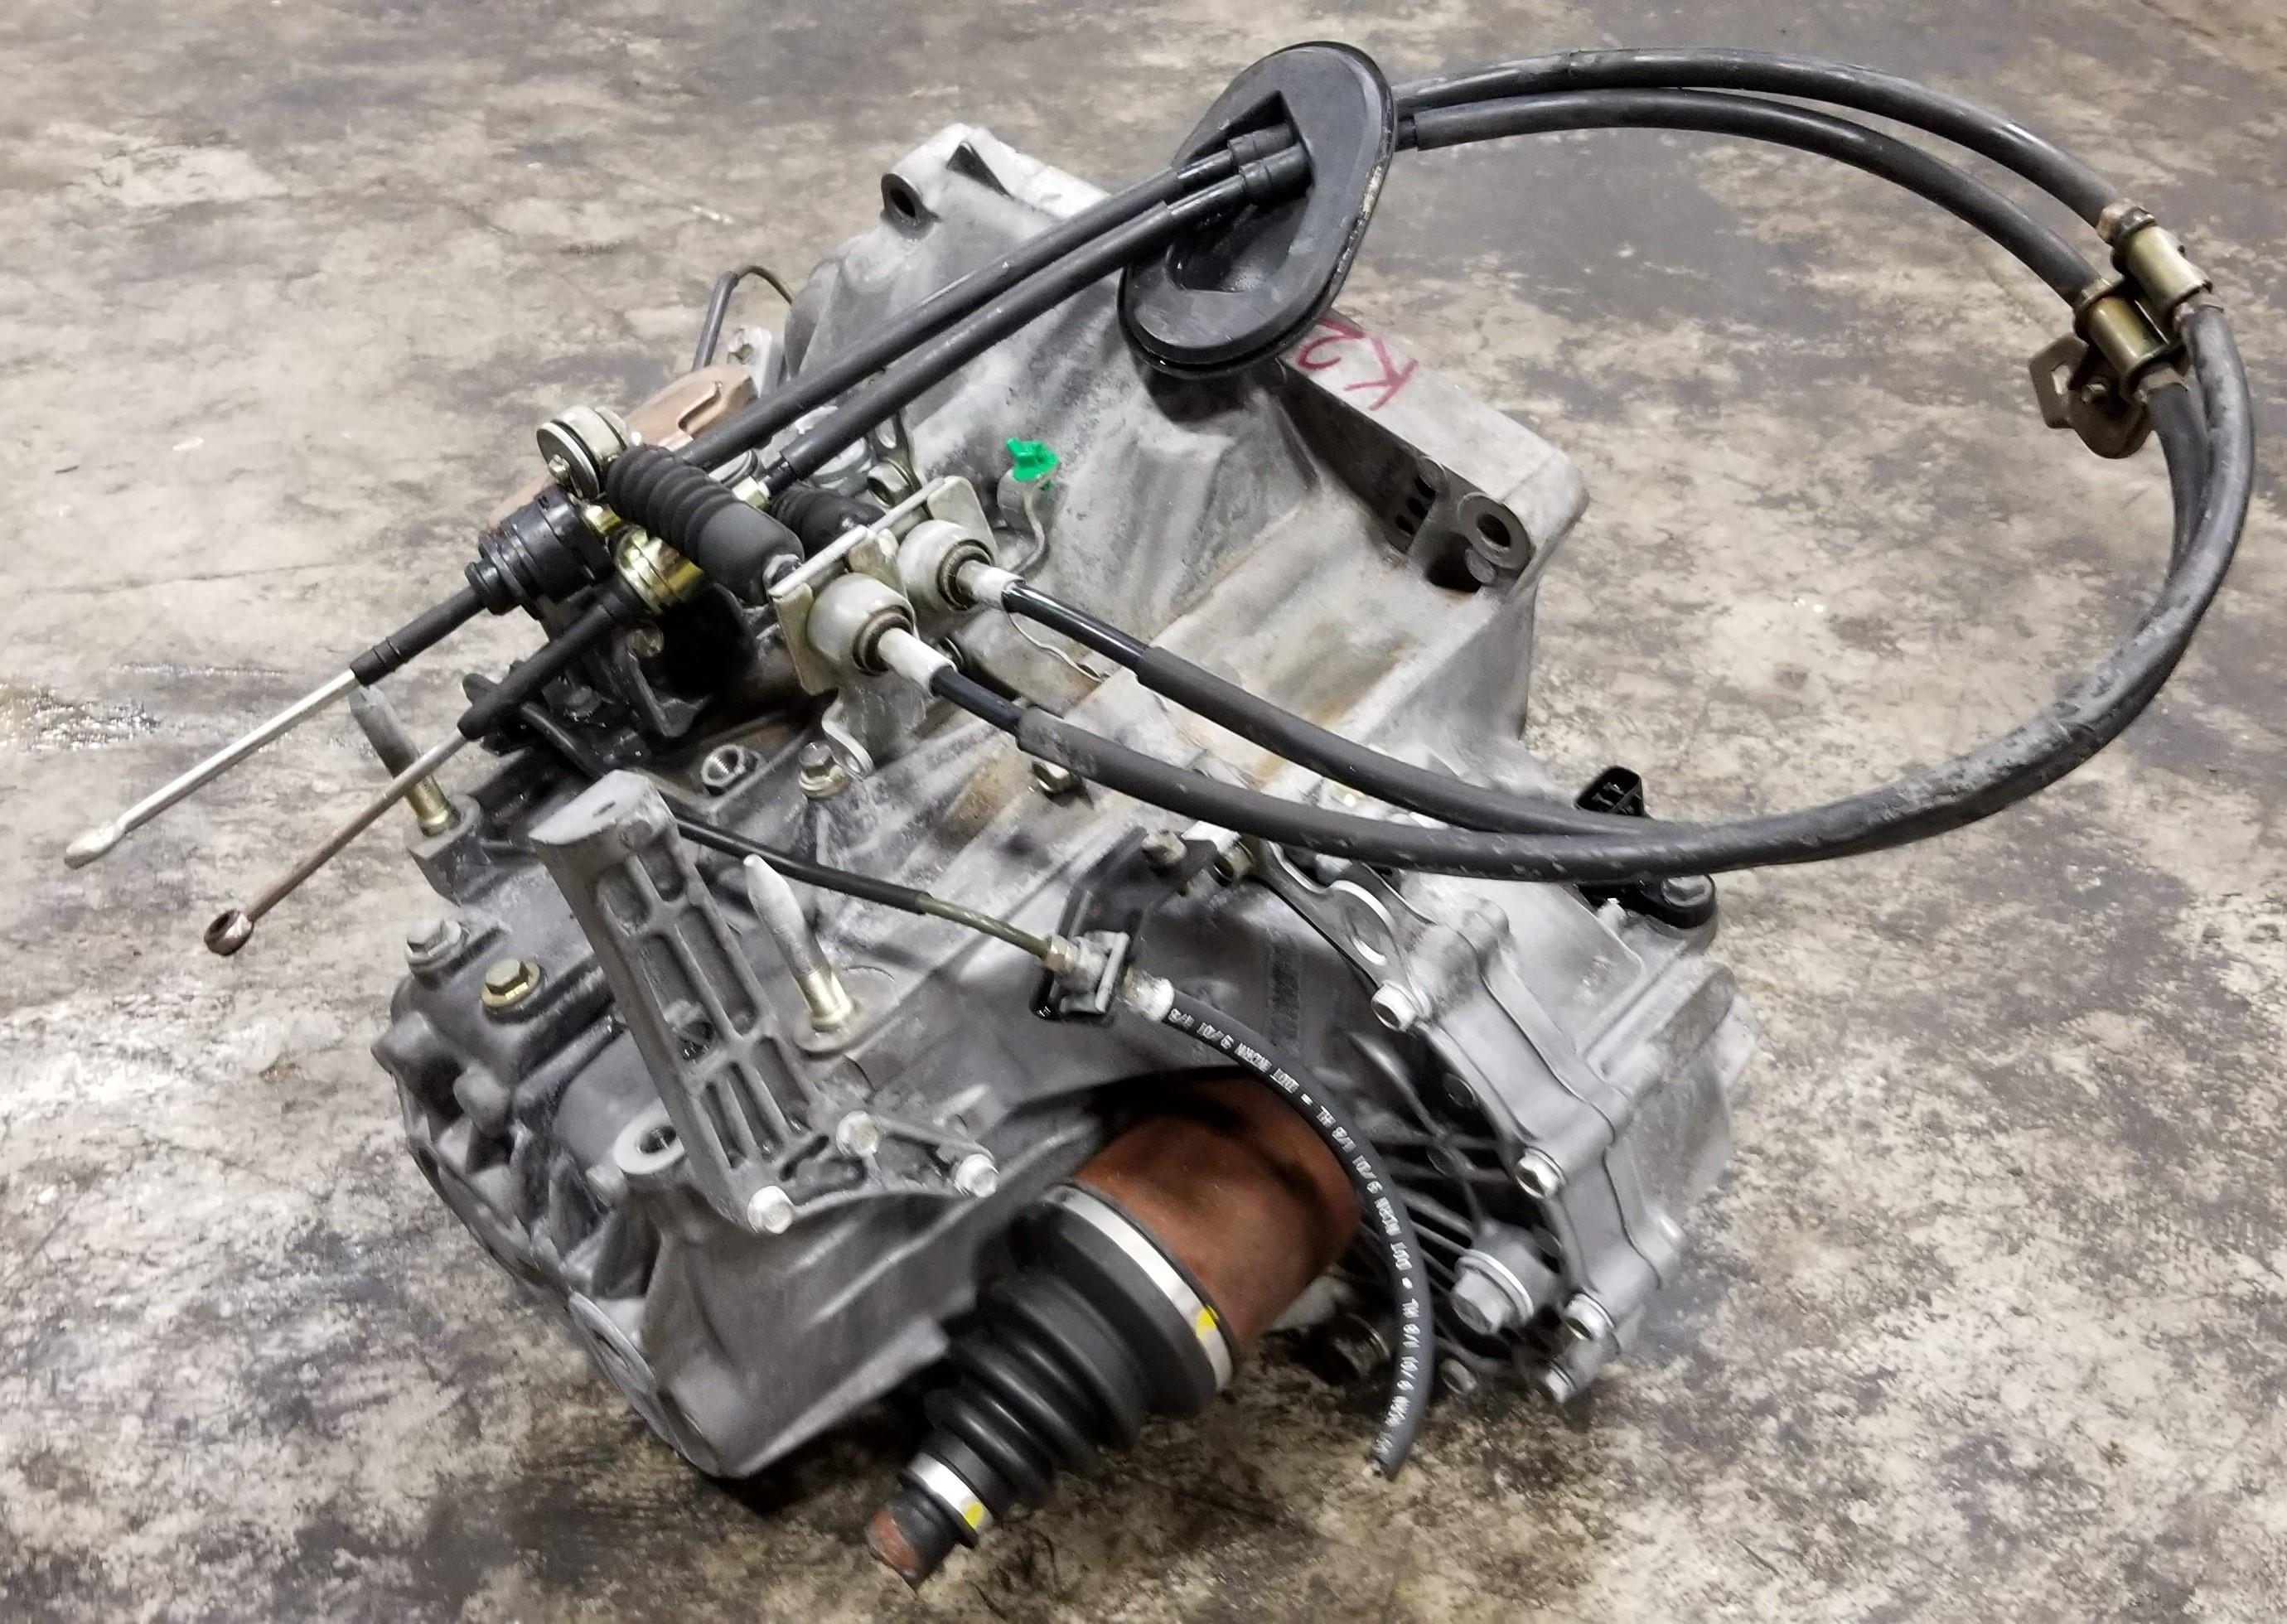 Nissan Chula Vista >> K20A 2002-2005 JDM Honda Acura K20 Manual Transmission 5 speed vtec K20 W2M5 | JDM Of San Diego